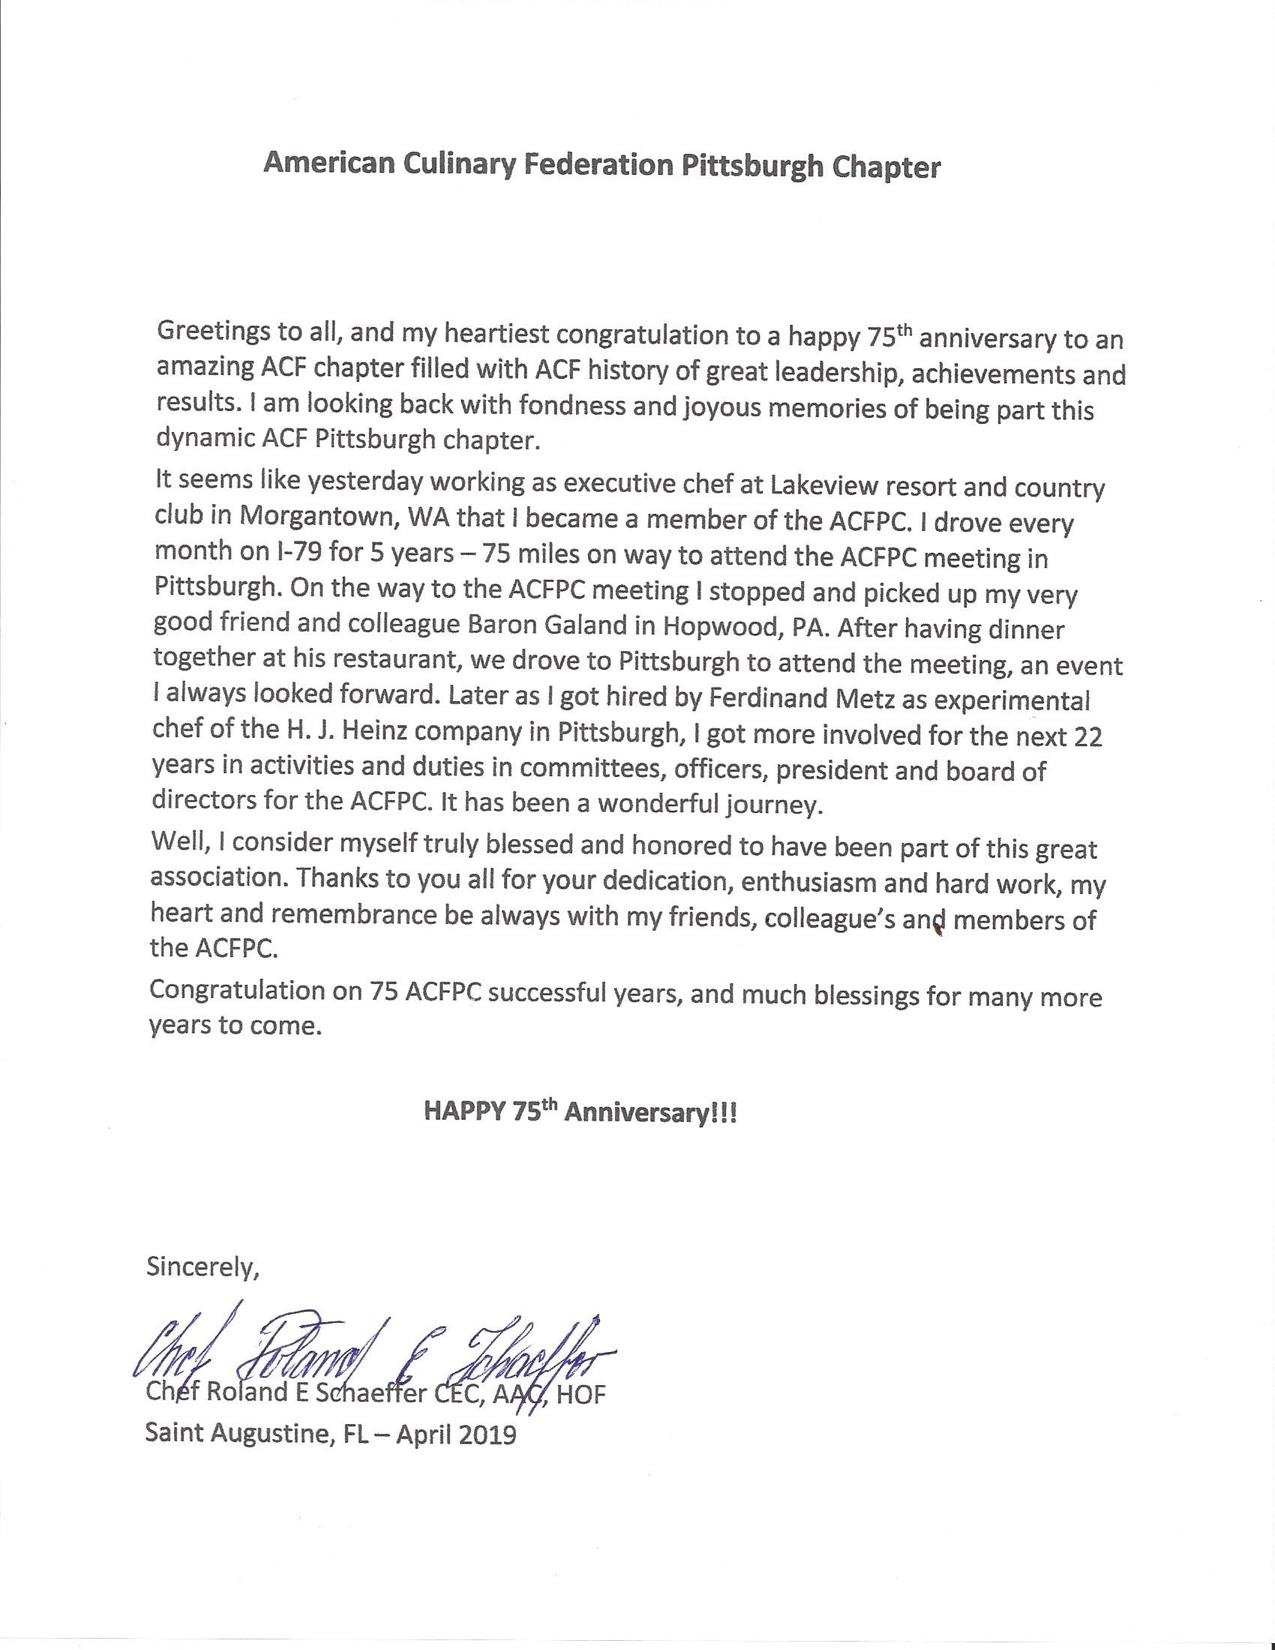 Roland Schaeffer letter.png